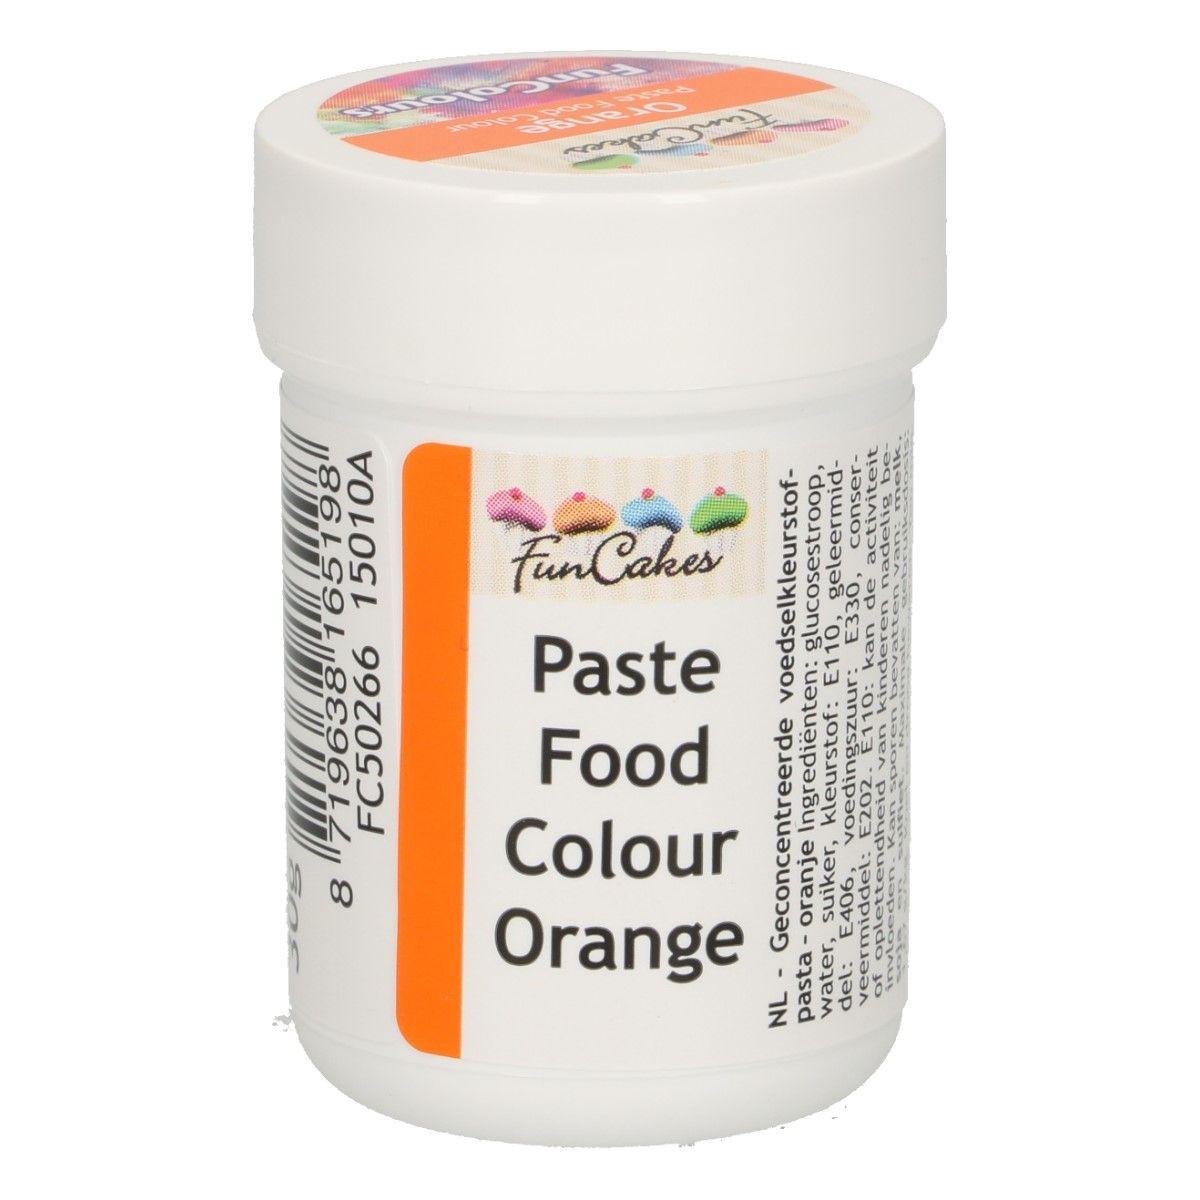 Funcakes FunColours Paste Food Colour - Orange 30 g